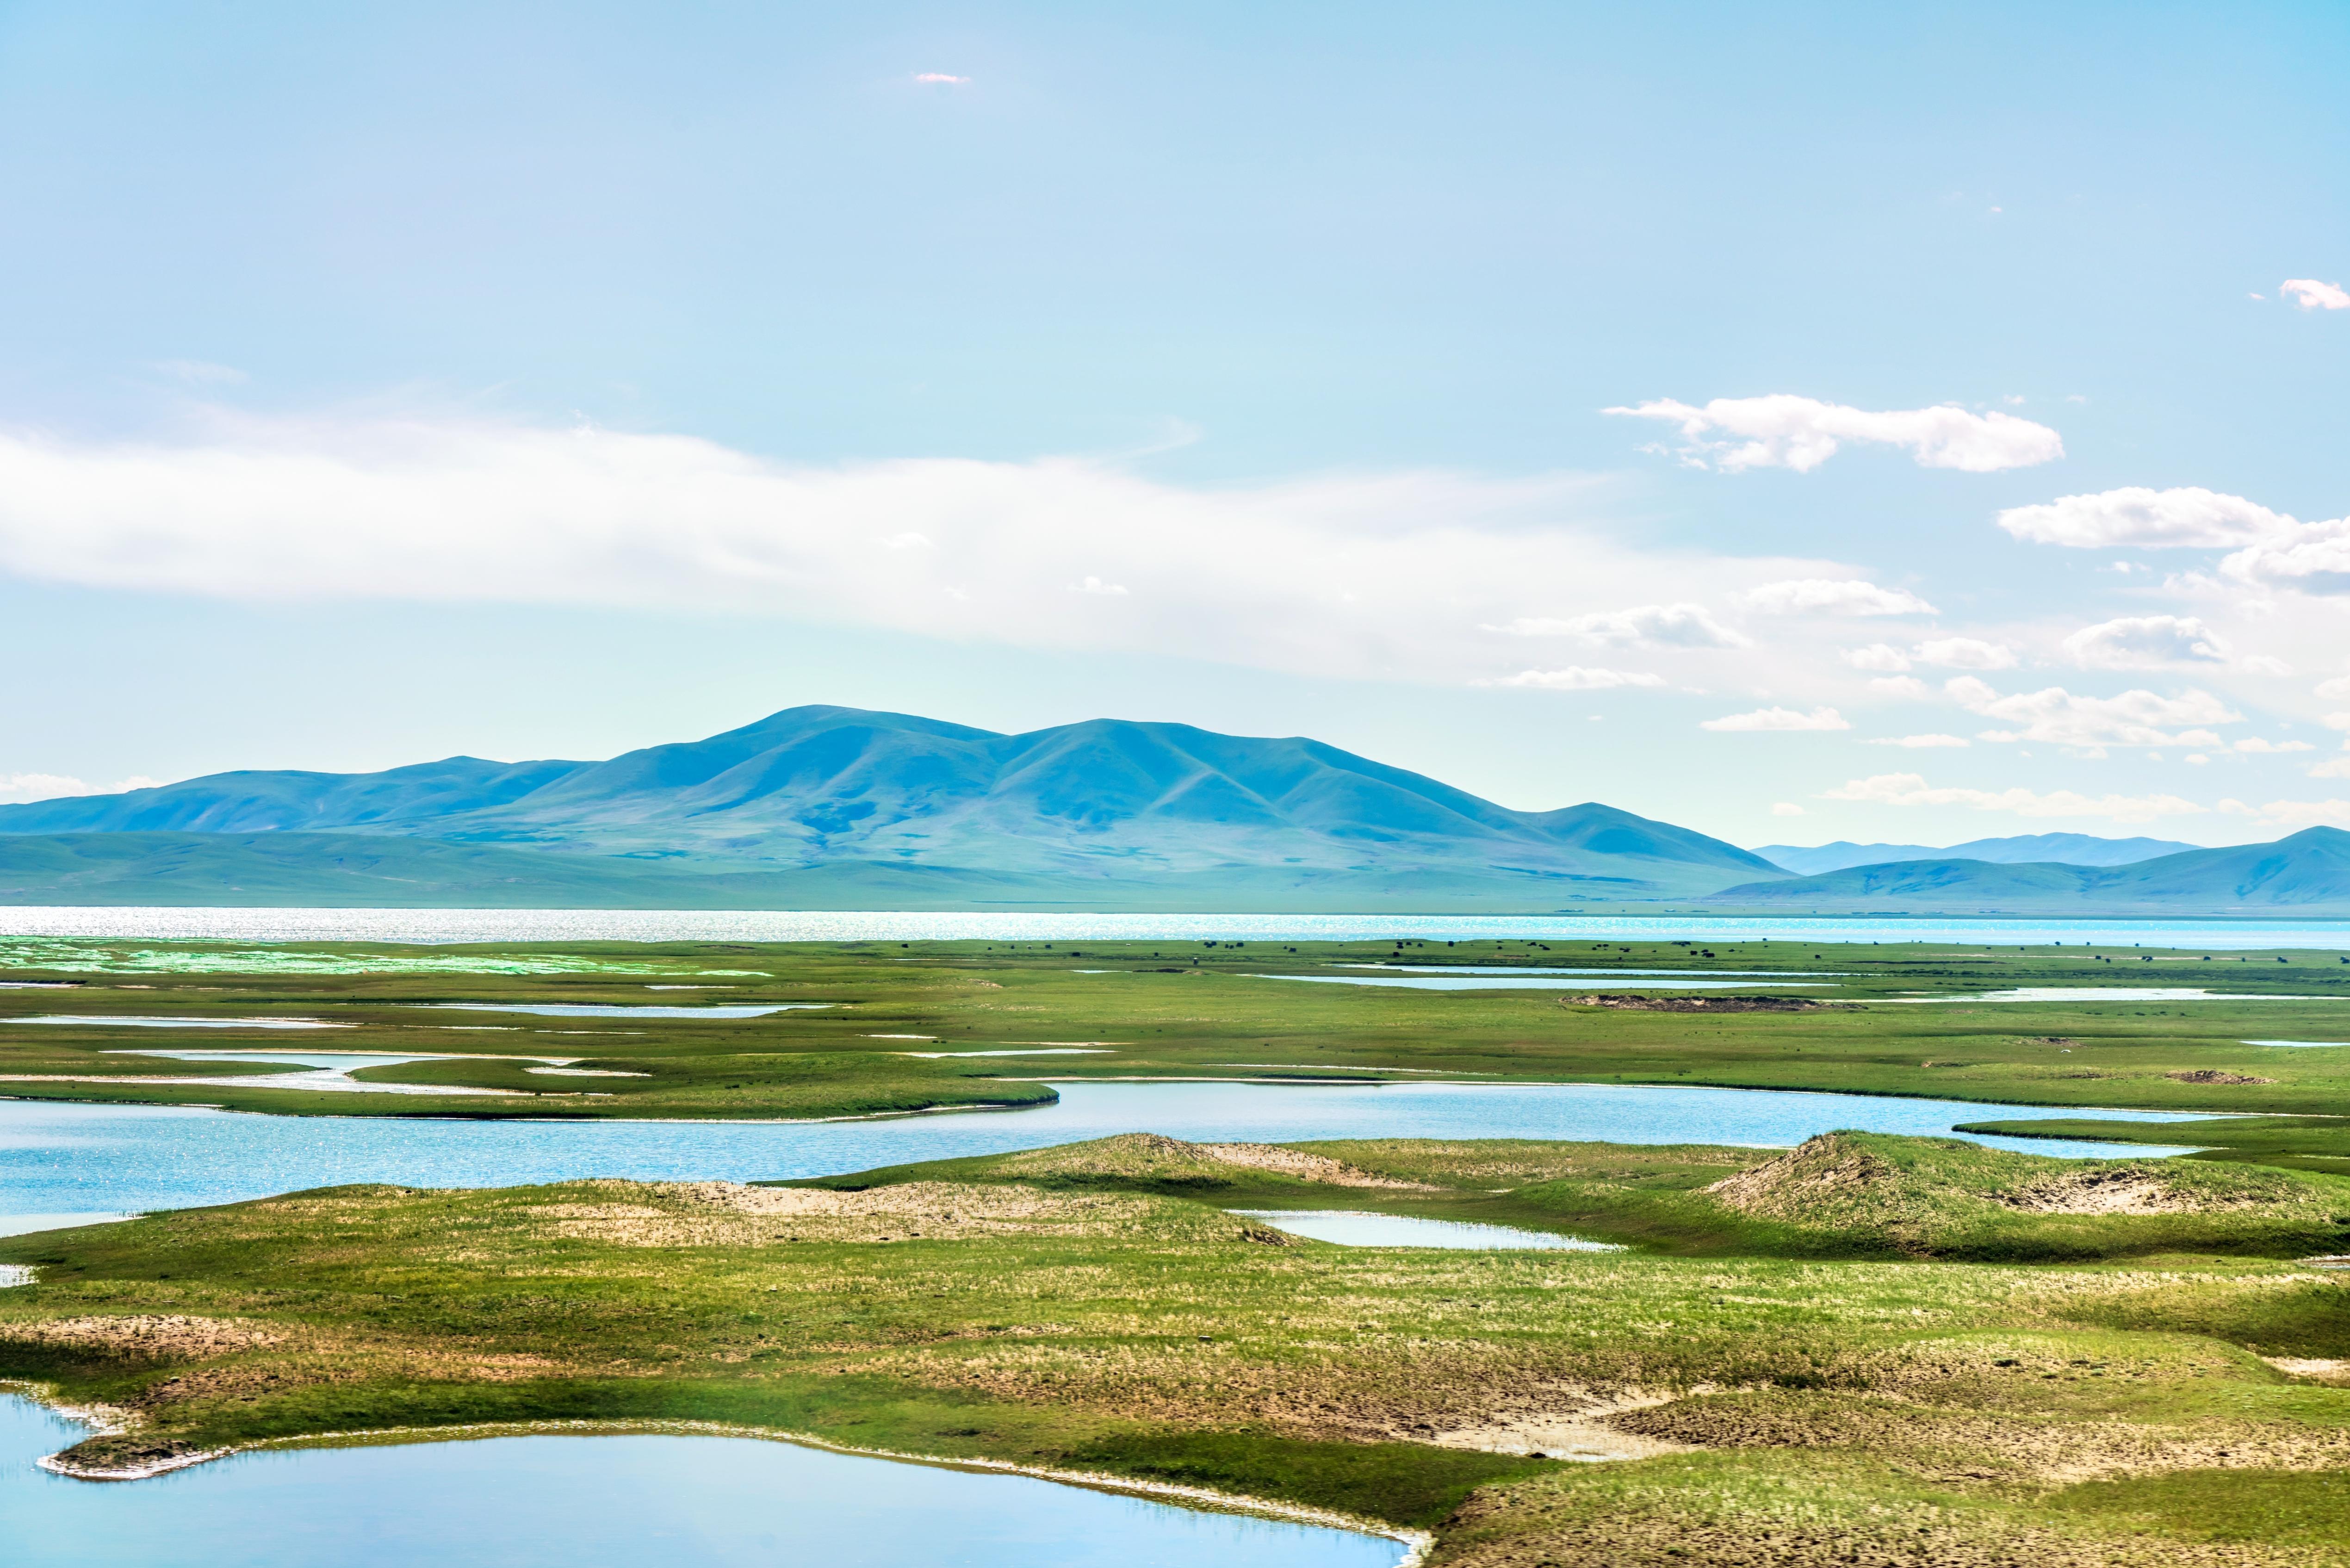 Sanjiangyuan Natural Reserve